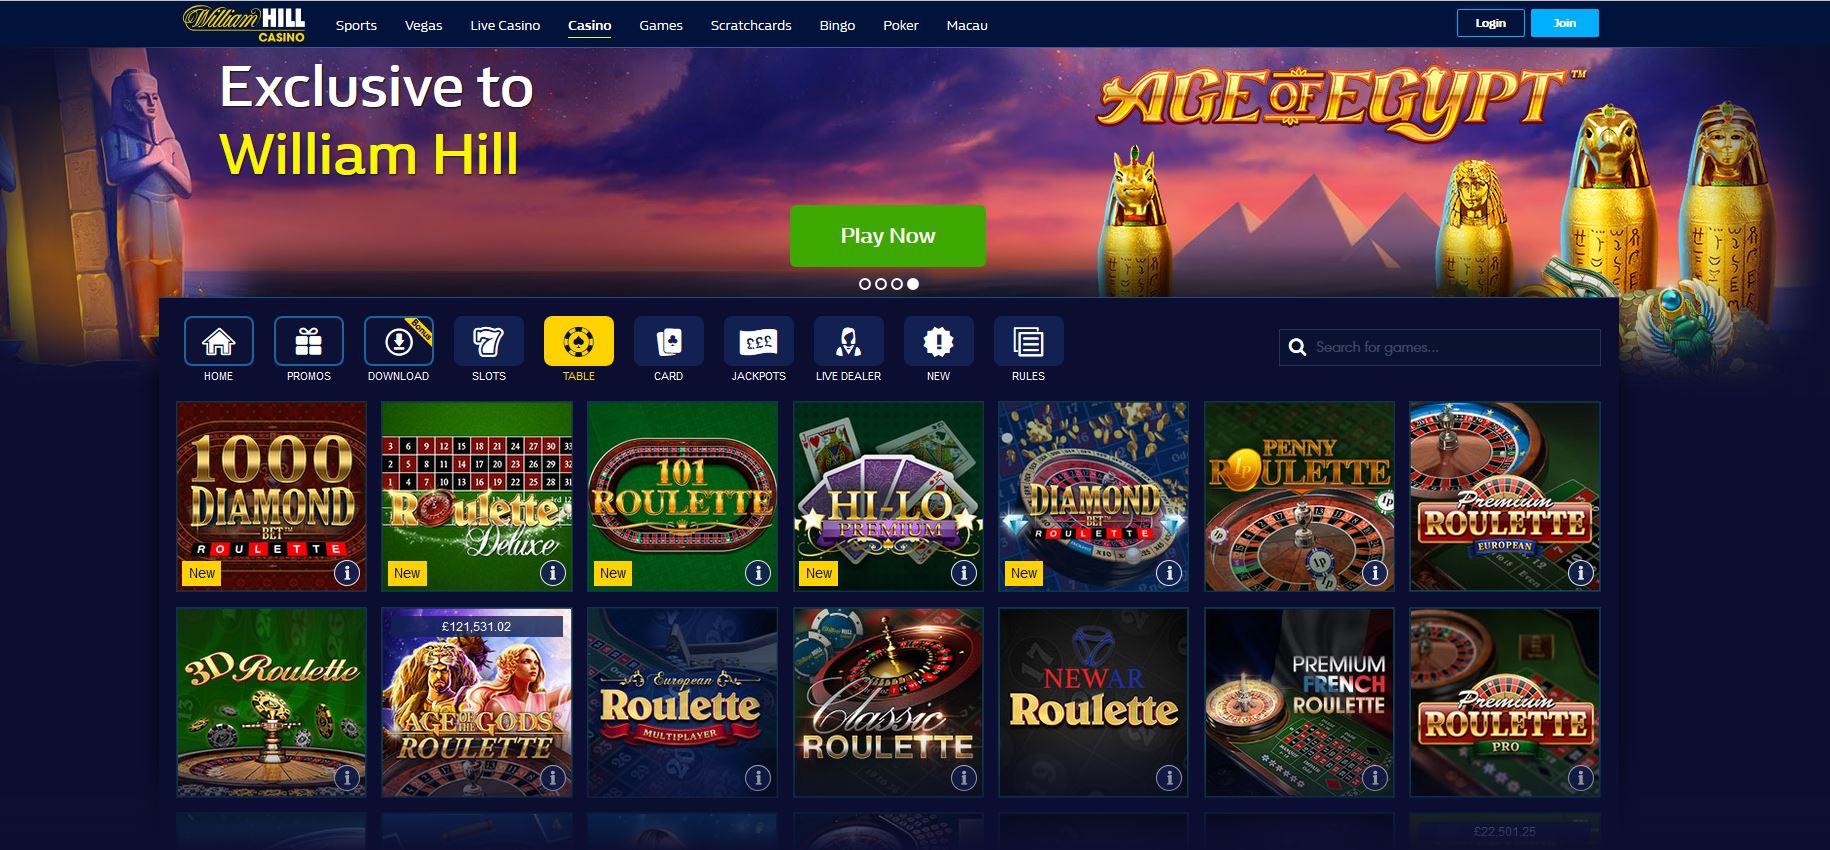 Mobile william hill casino online confiables Belice 359757